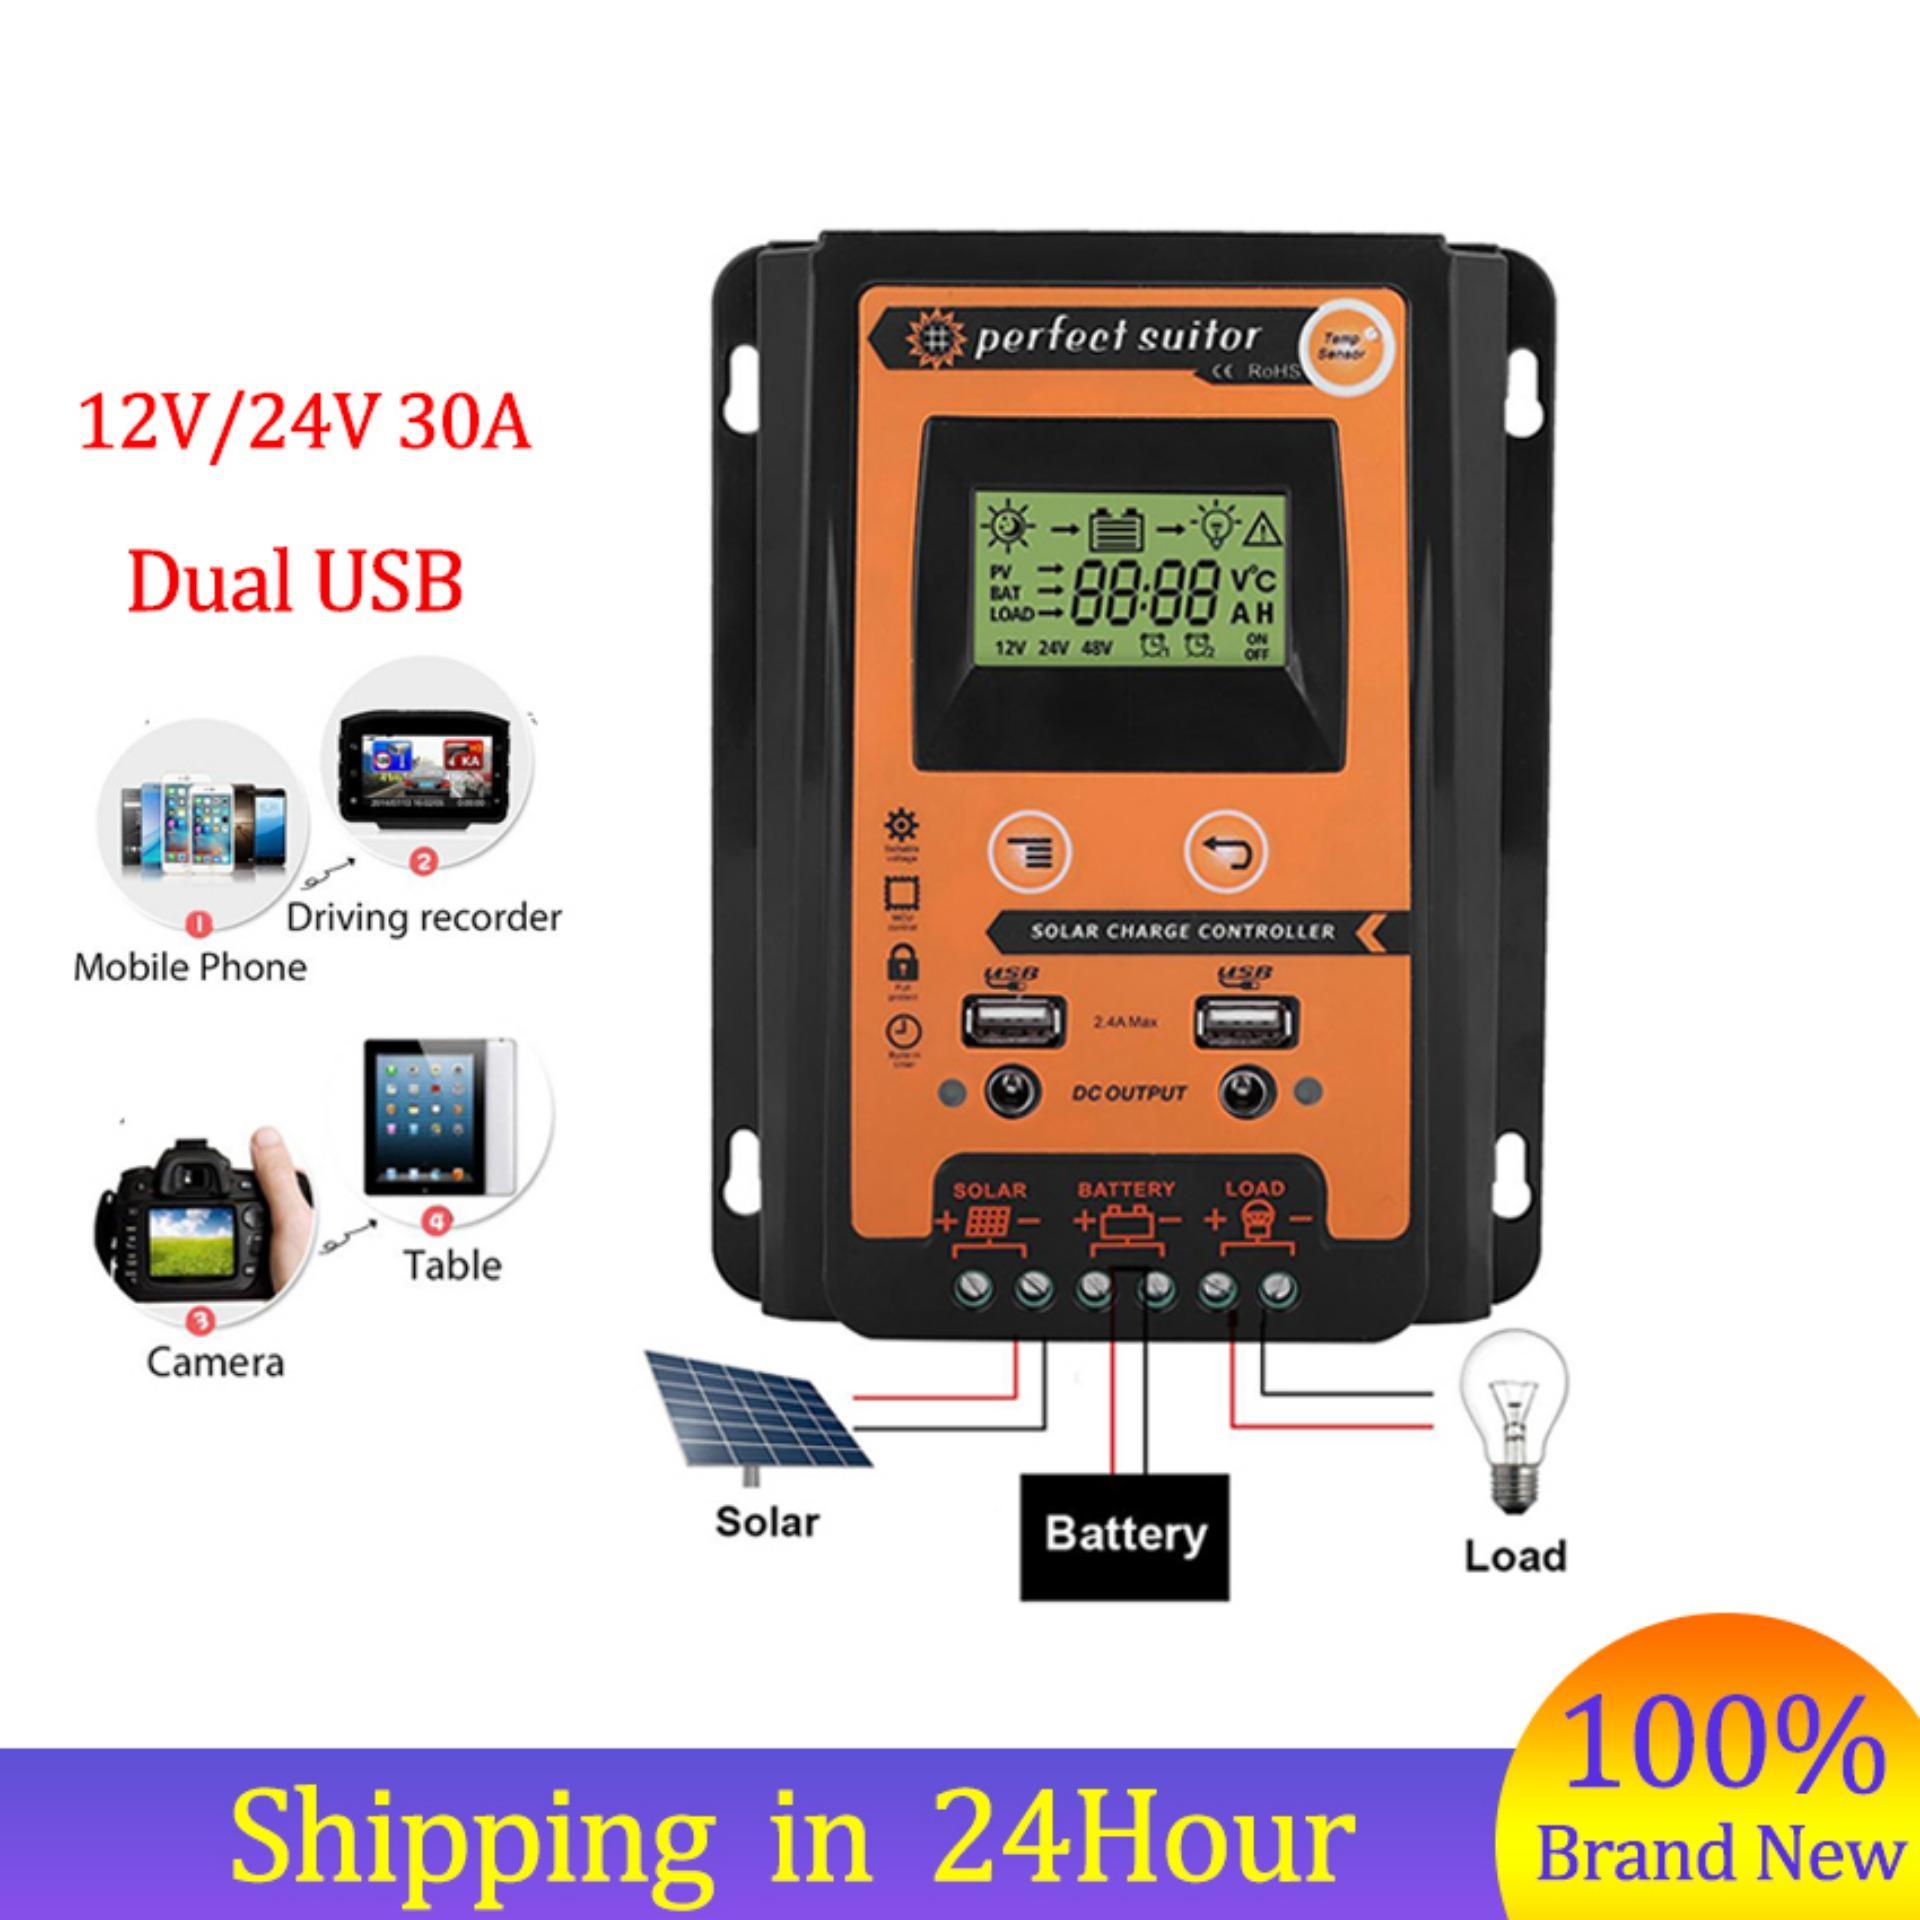 Buy Sell Cheapest Controller Kabel Pengatur Best Quality Product Speed Control Nankai Kecepatan Mesin Promotion12 V 24 30a Mppt Solar Beban Panel Surya